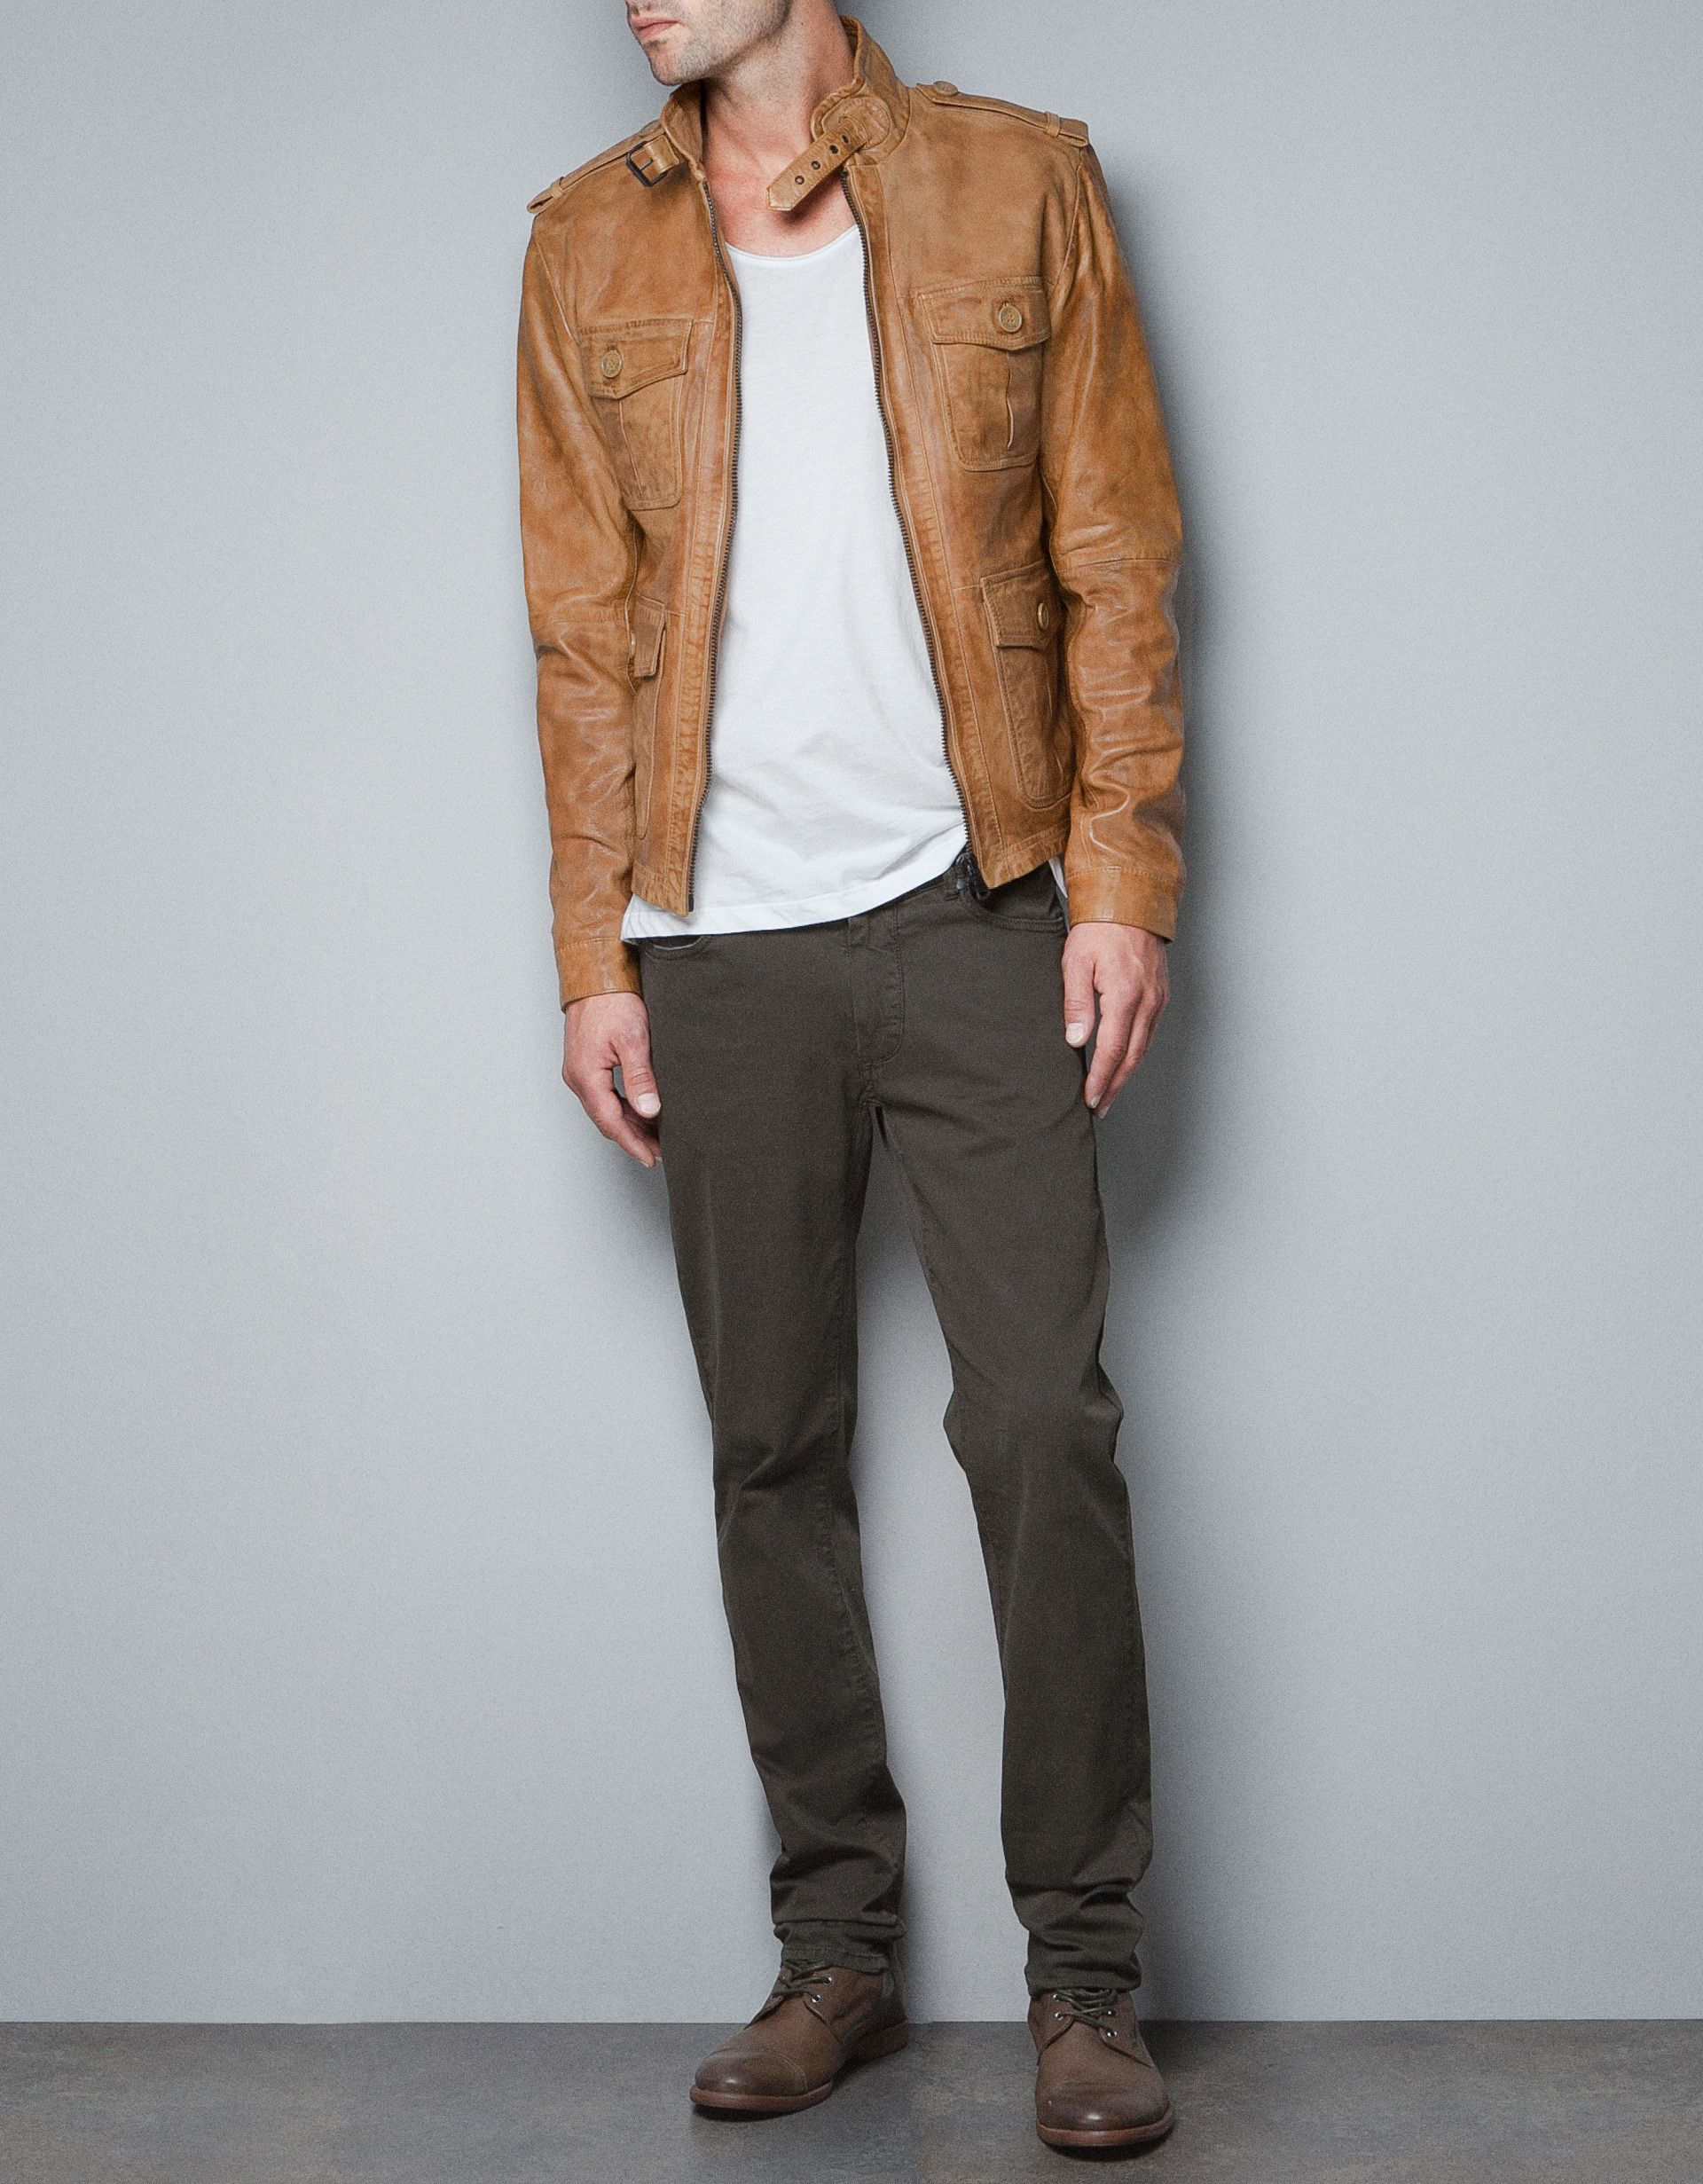 LEATHER JACKET Zara leather jacket, Leather jacket men